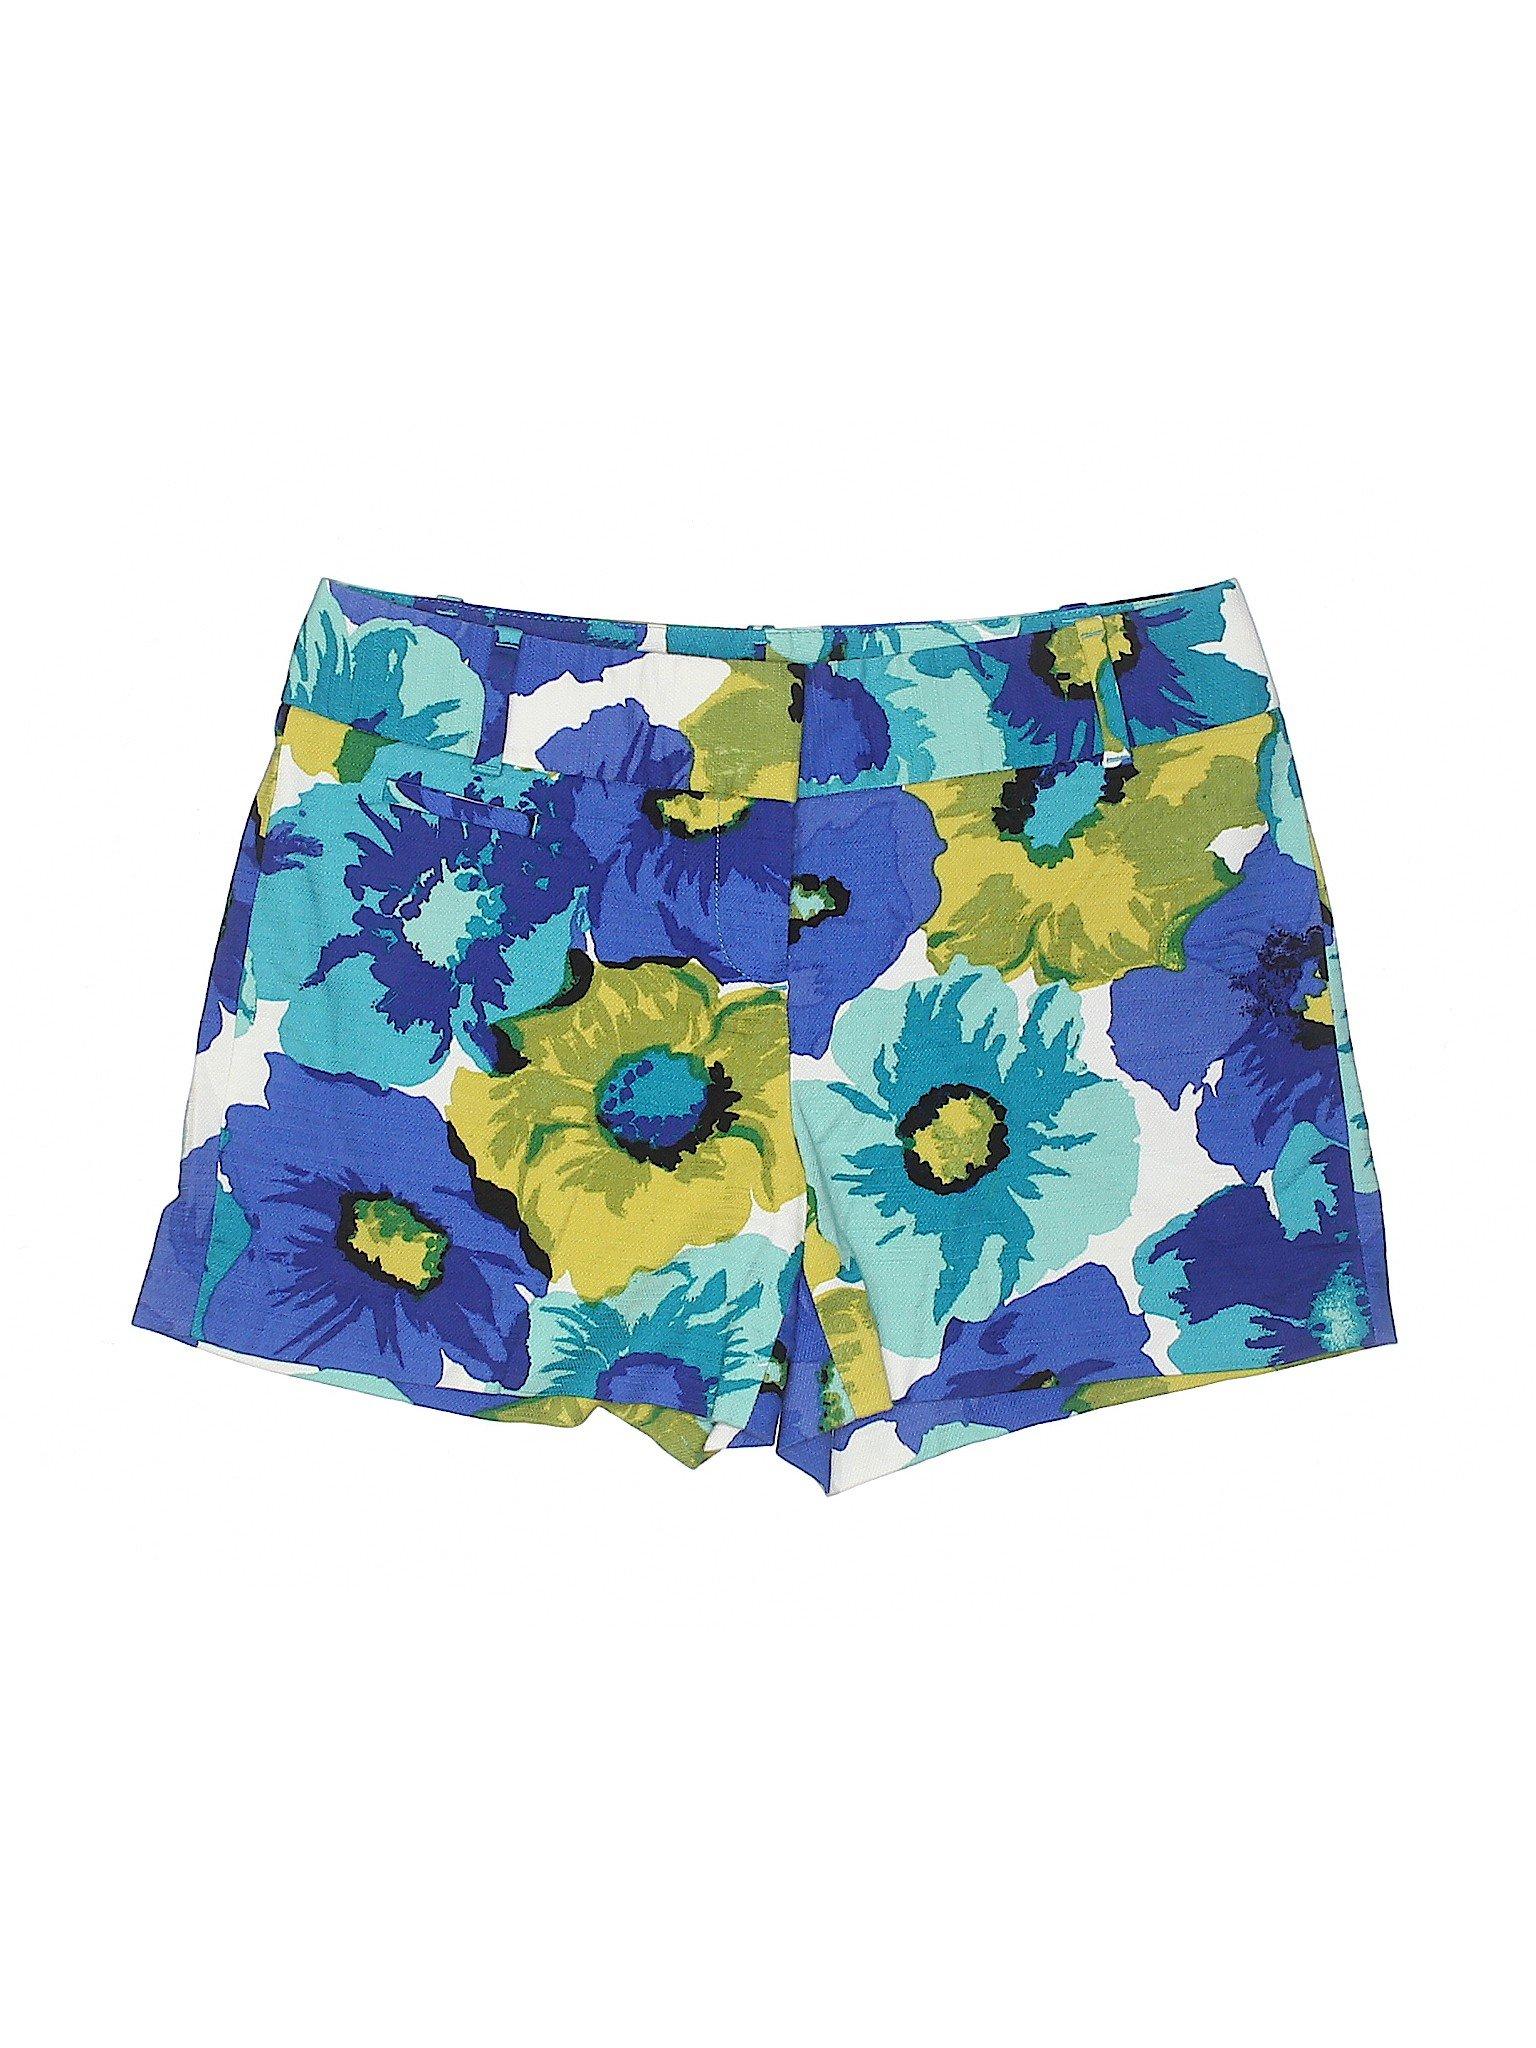 Taylor Ann Khaki Boutique LOFT Shorts Zw8FXz4qx